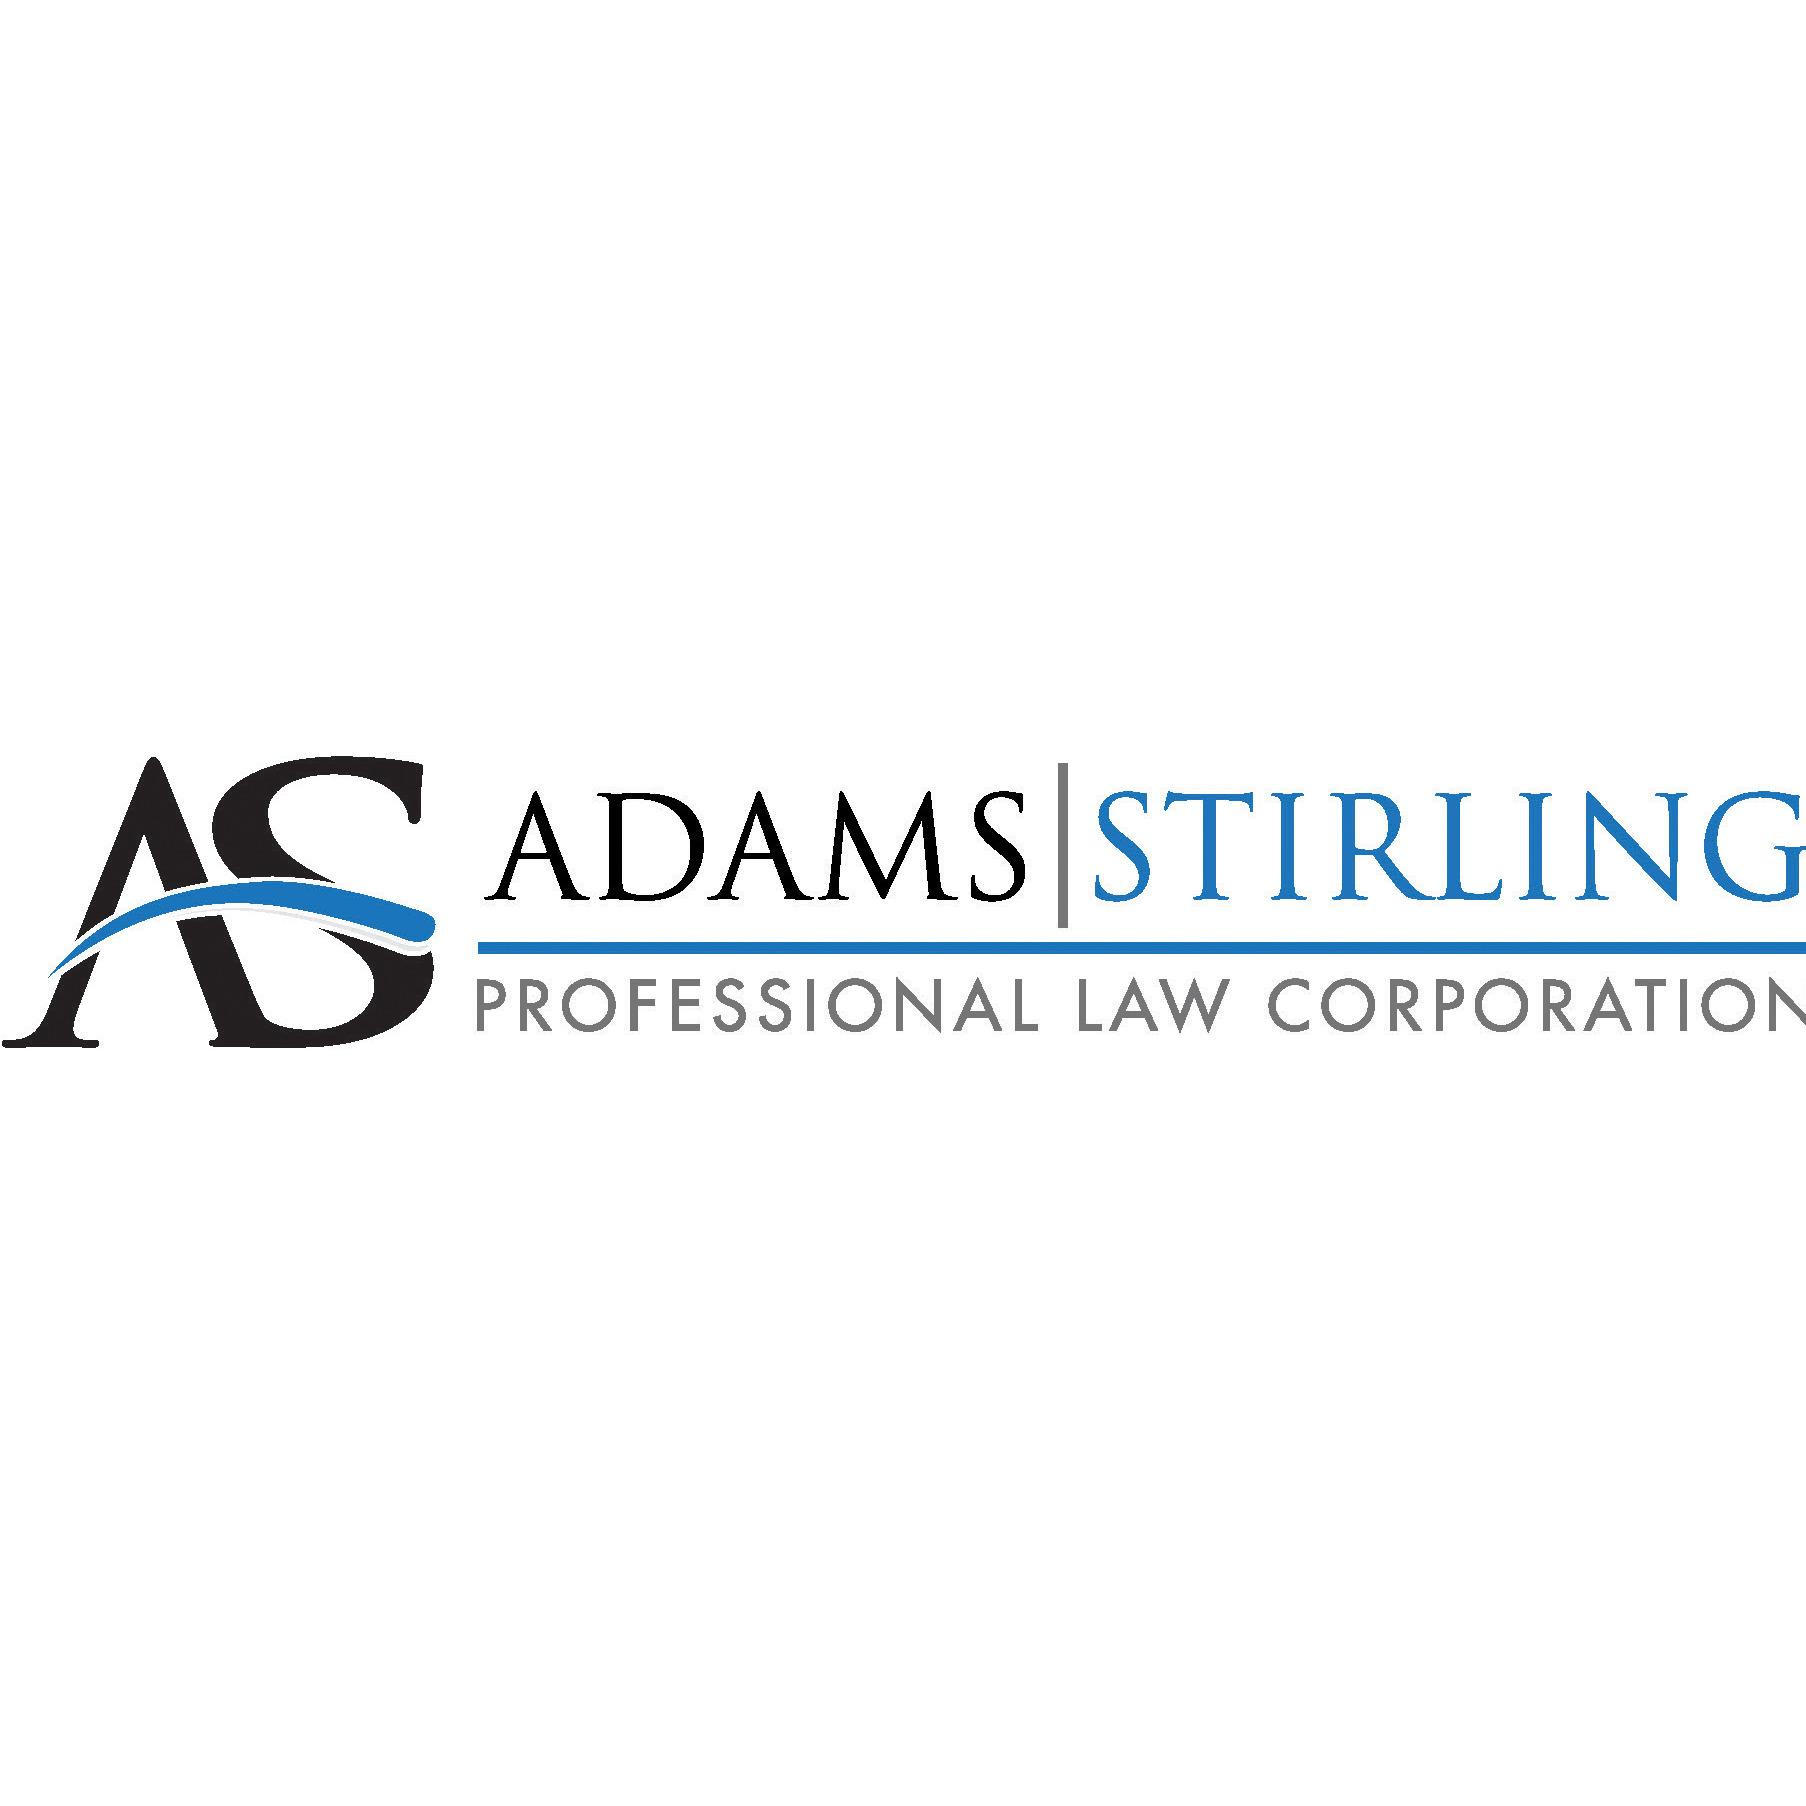 Adams Stirling PLC